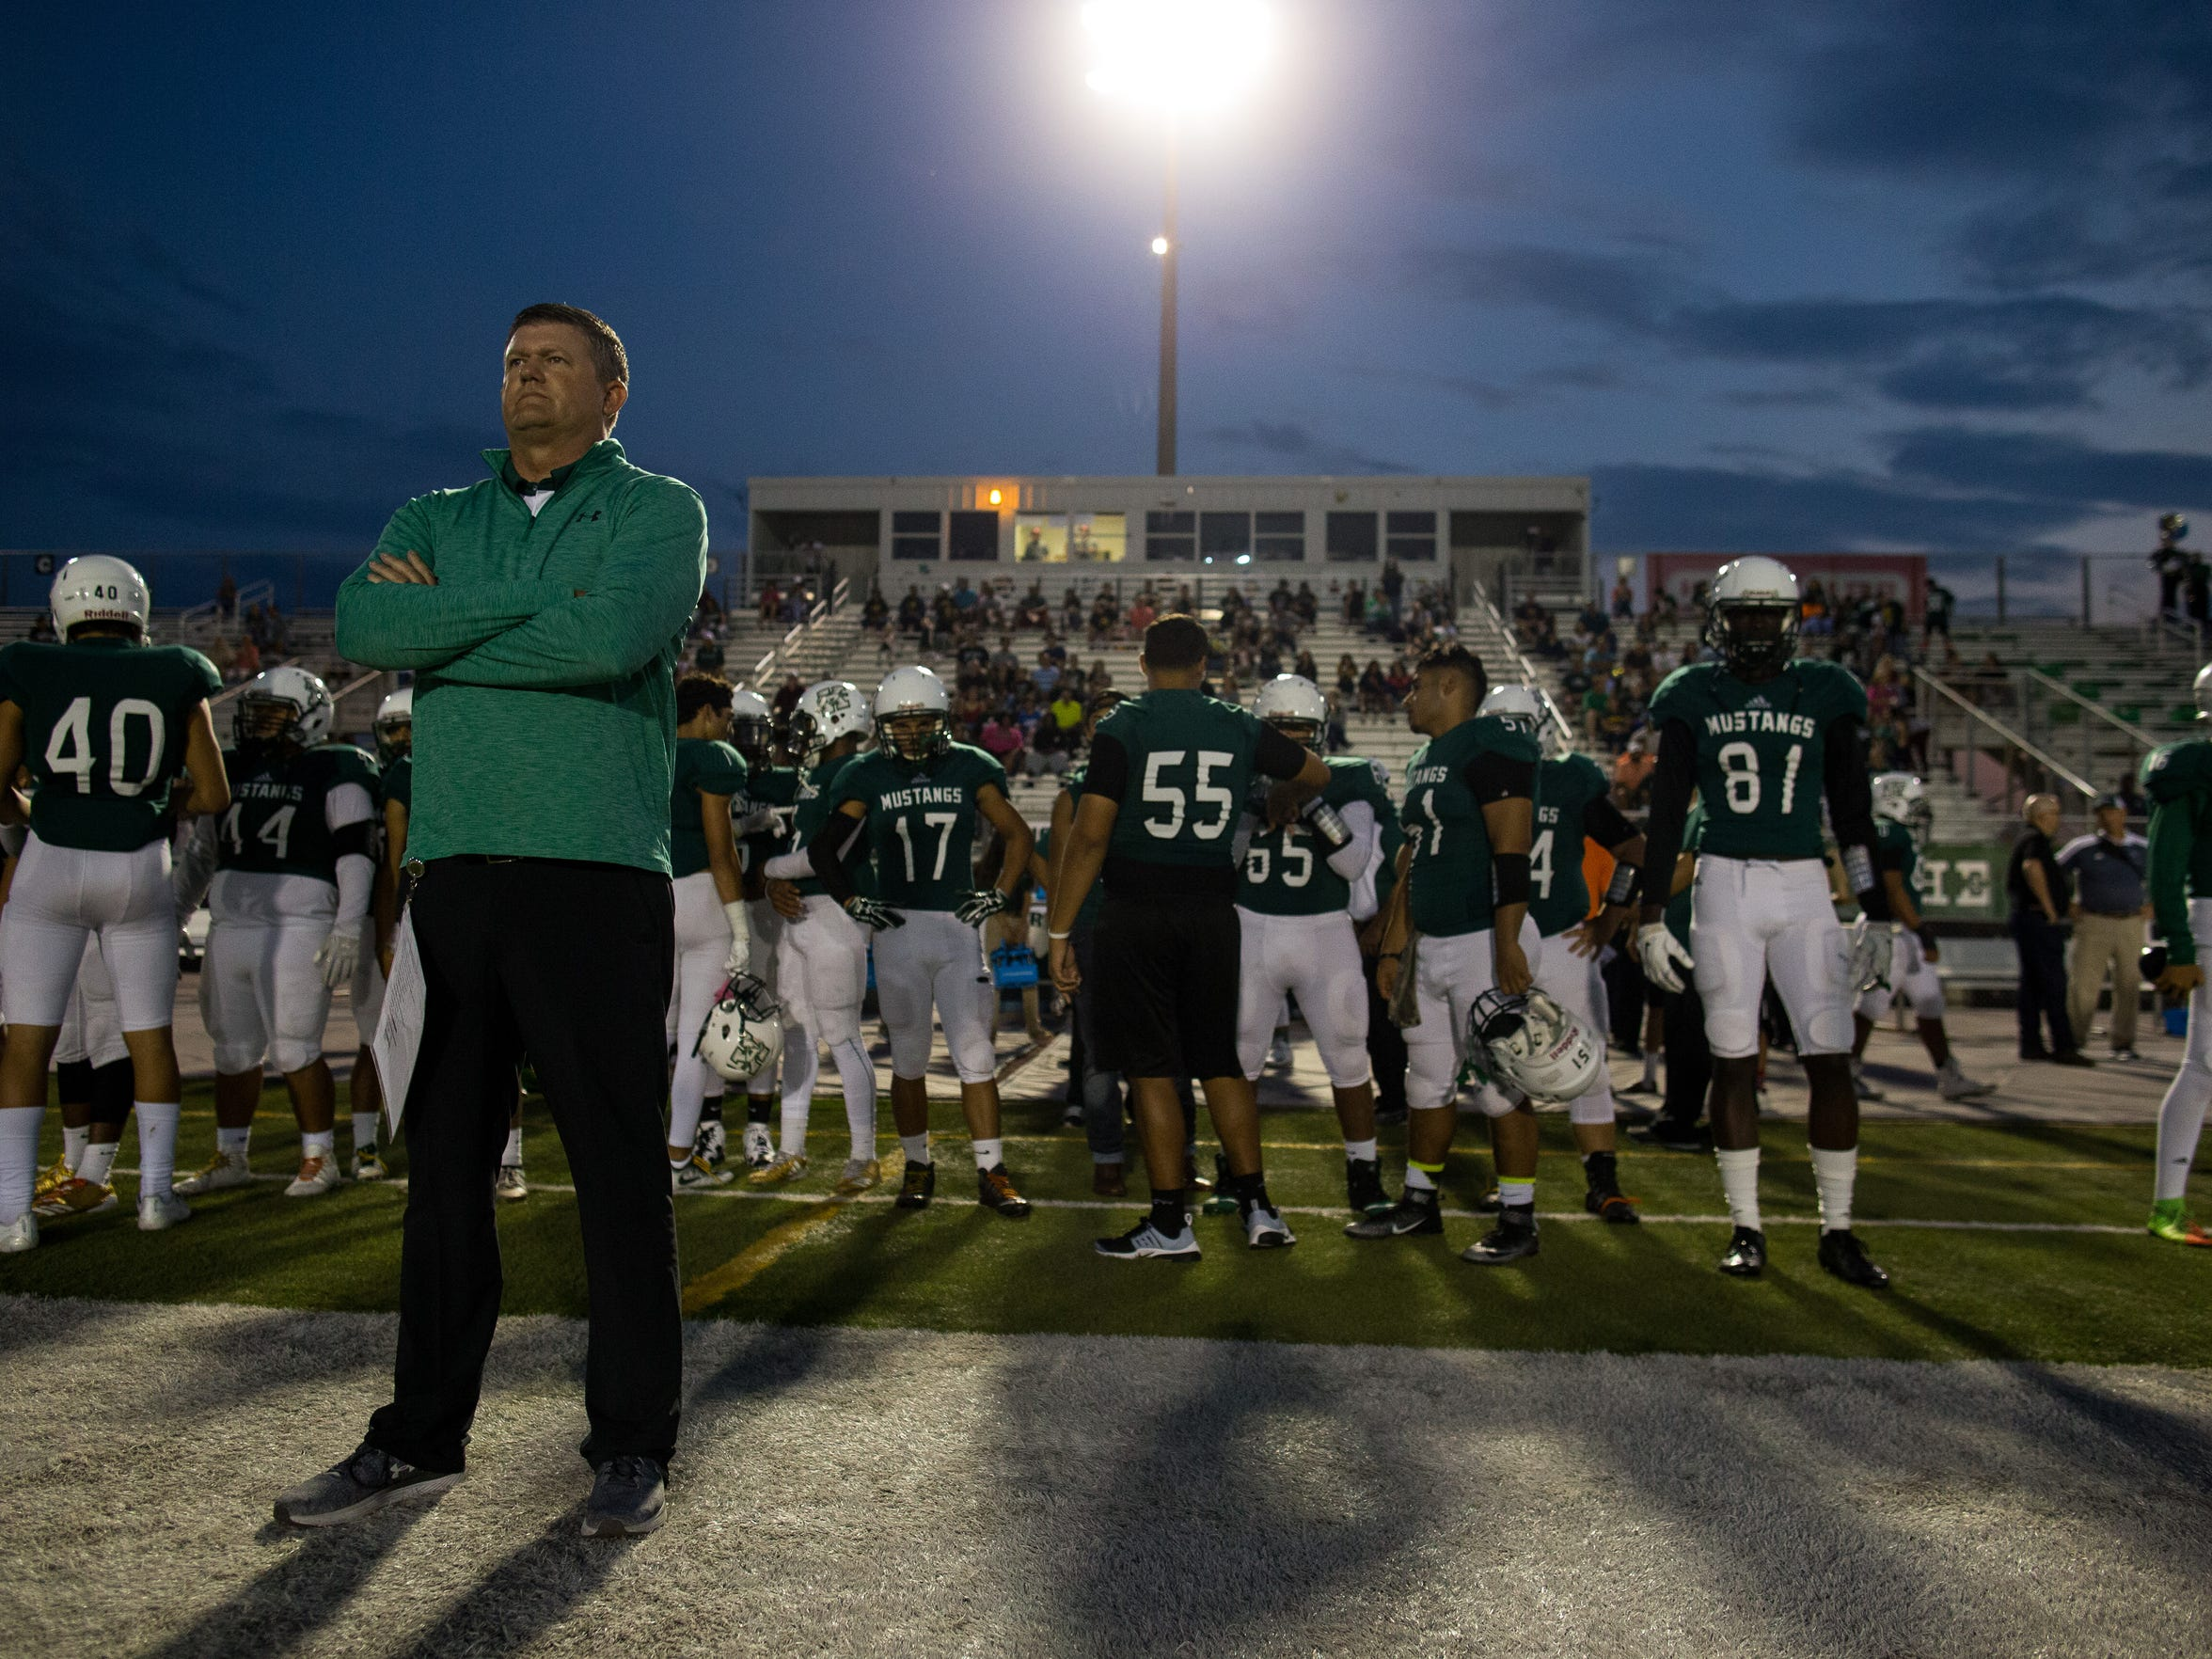 King's head coach Eddie Hesseltine watches from the